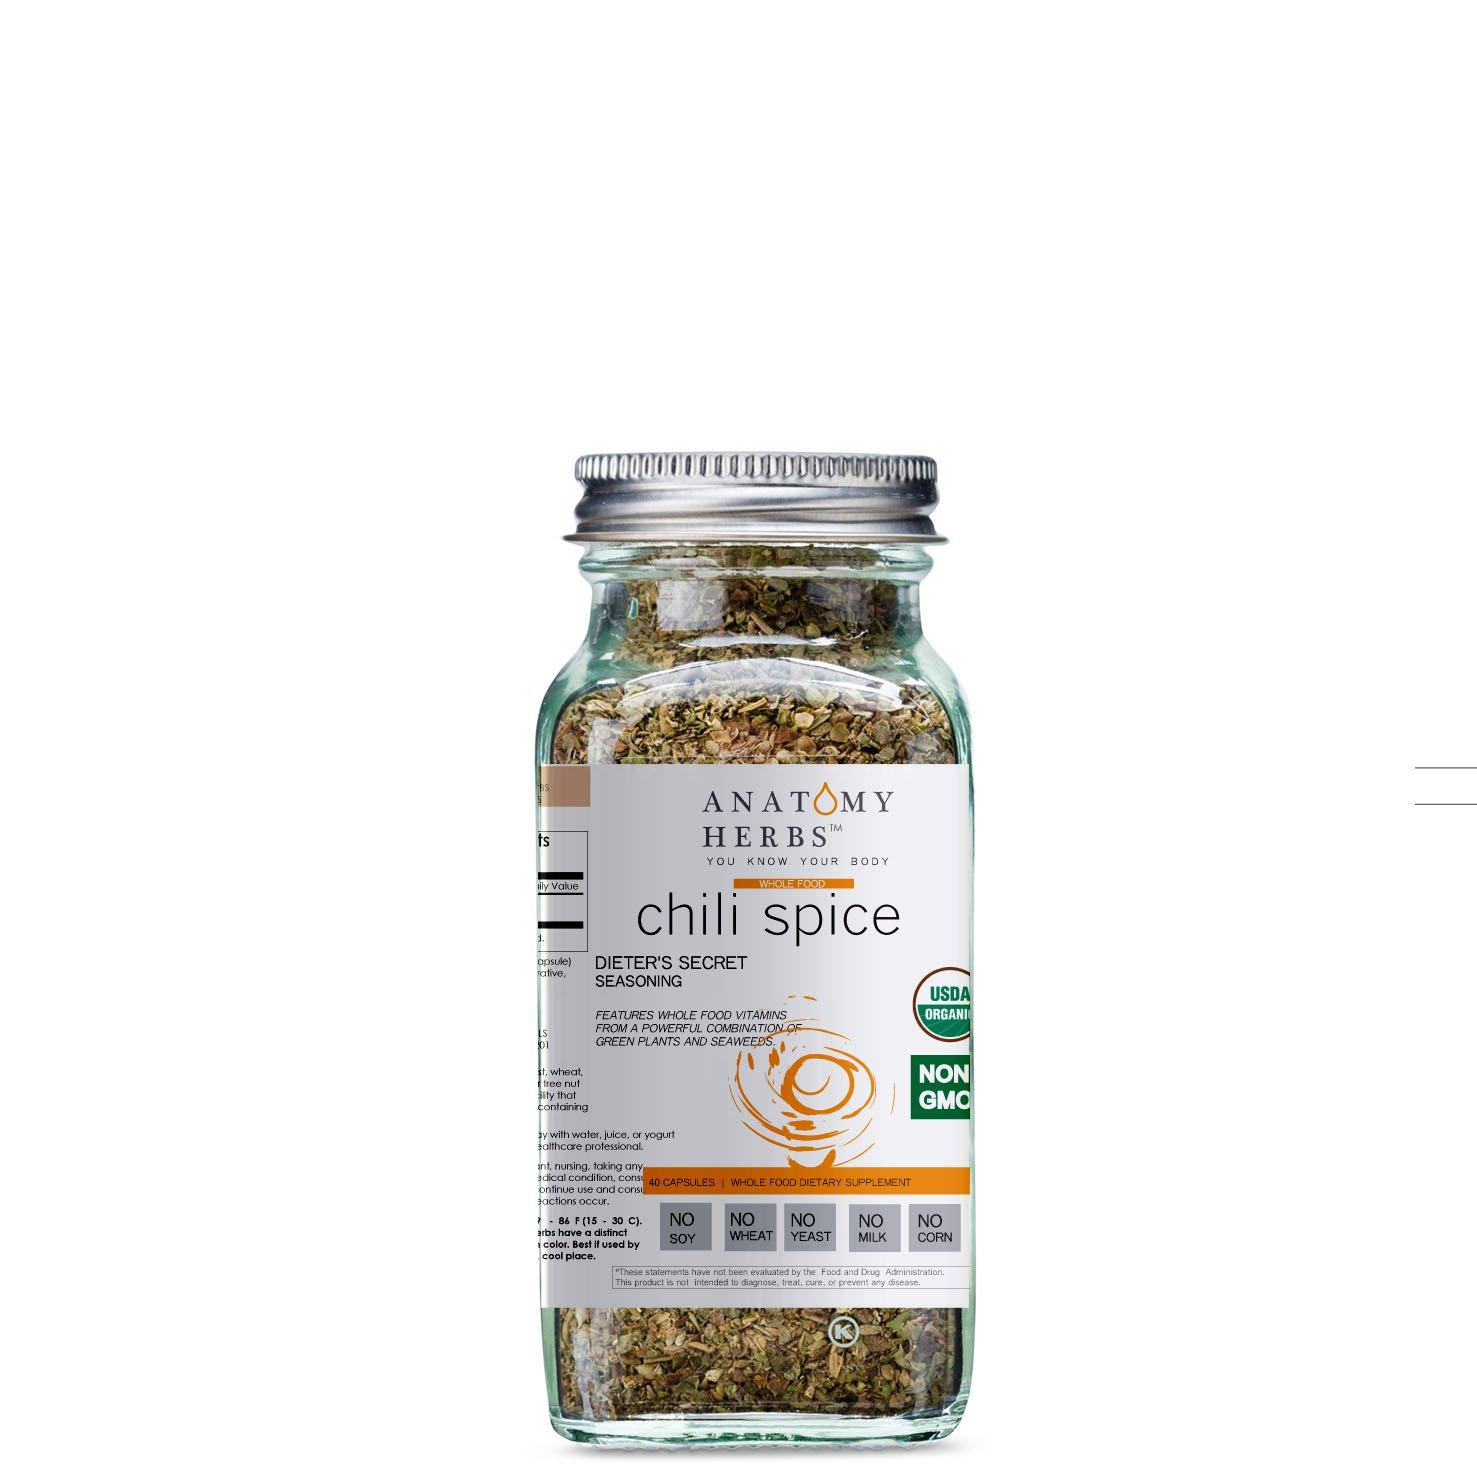 Chili Spice Dieter's Secret Seasoning (Fat Burner)